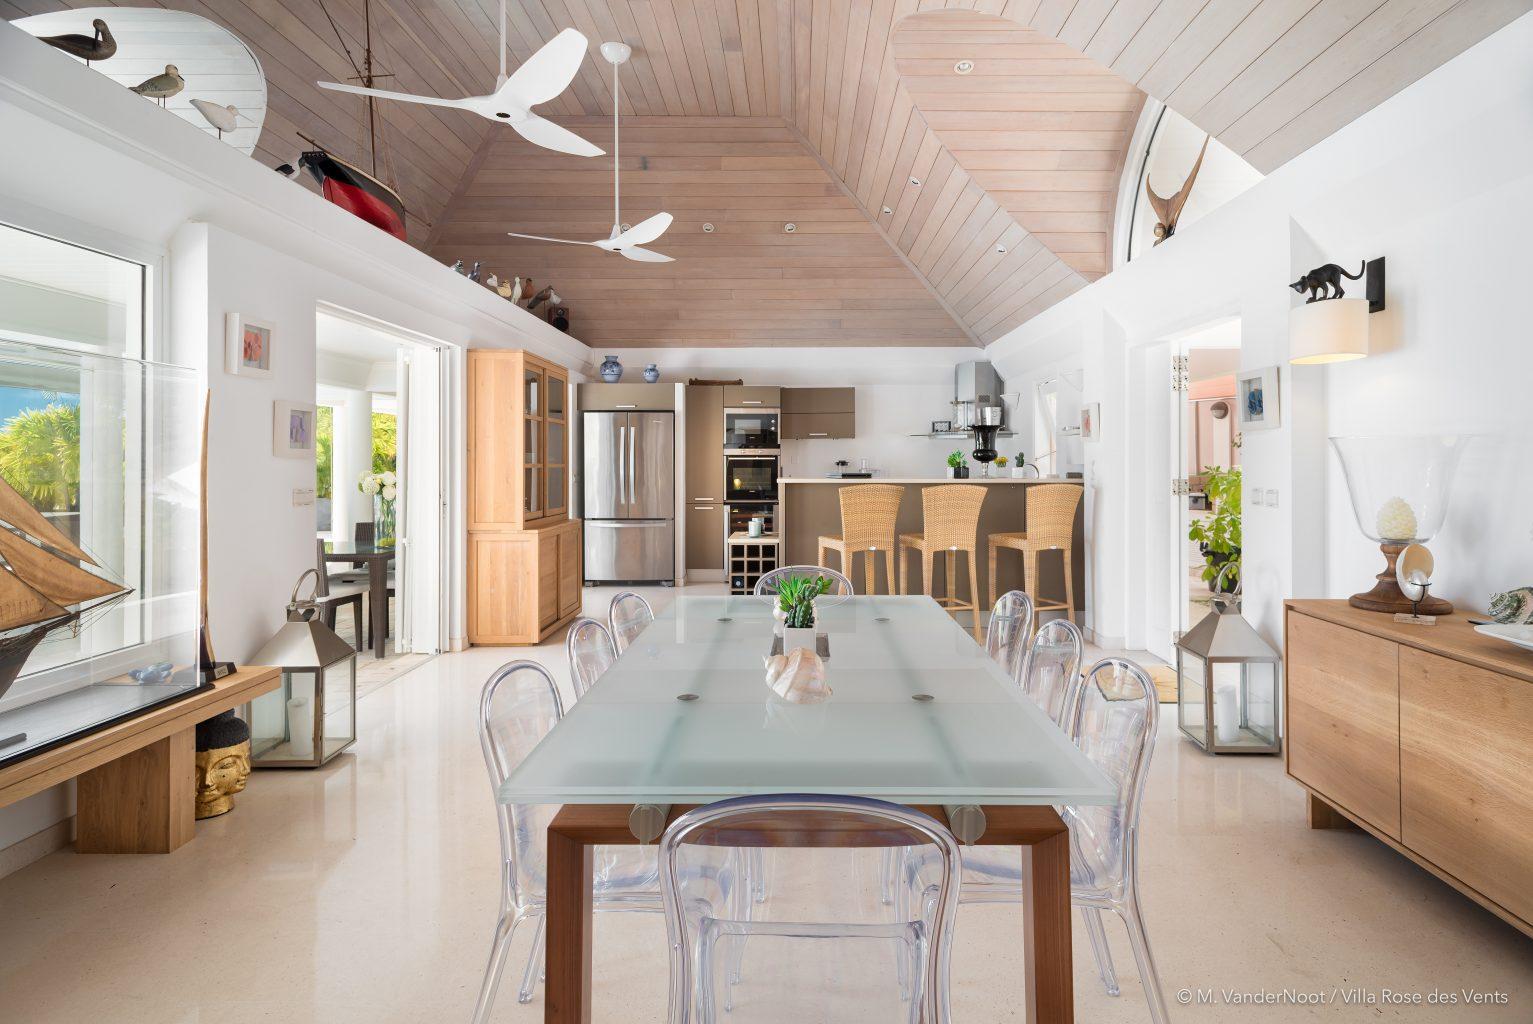 Villa Rose des Vents - Caribbean Villa Rental St Barth with Jacuzzi - Main Area